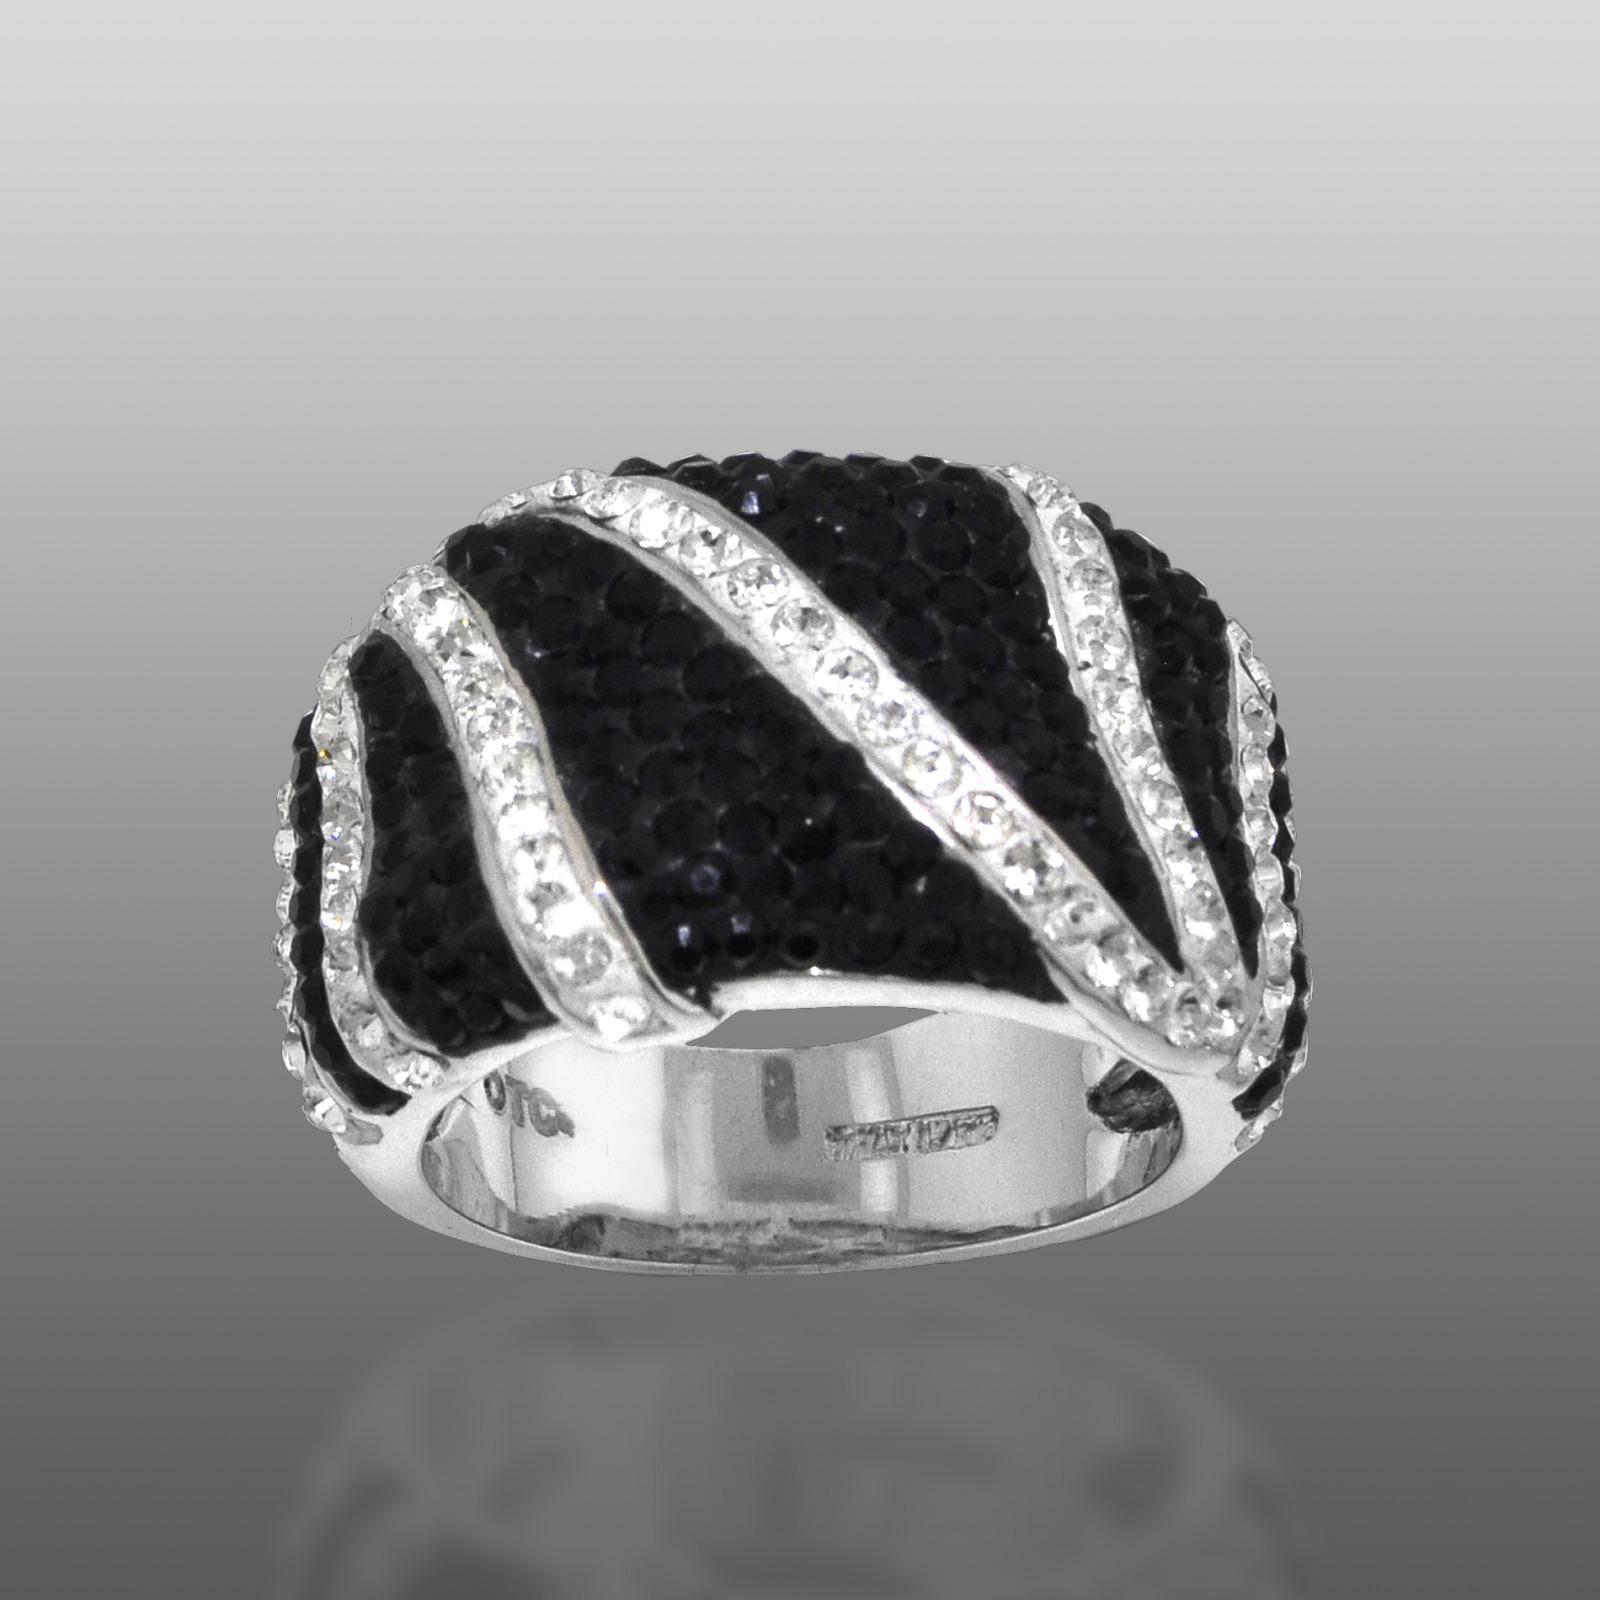 Shades Of Elegenace Platinum Over Bronze Black & White Zebra Ring